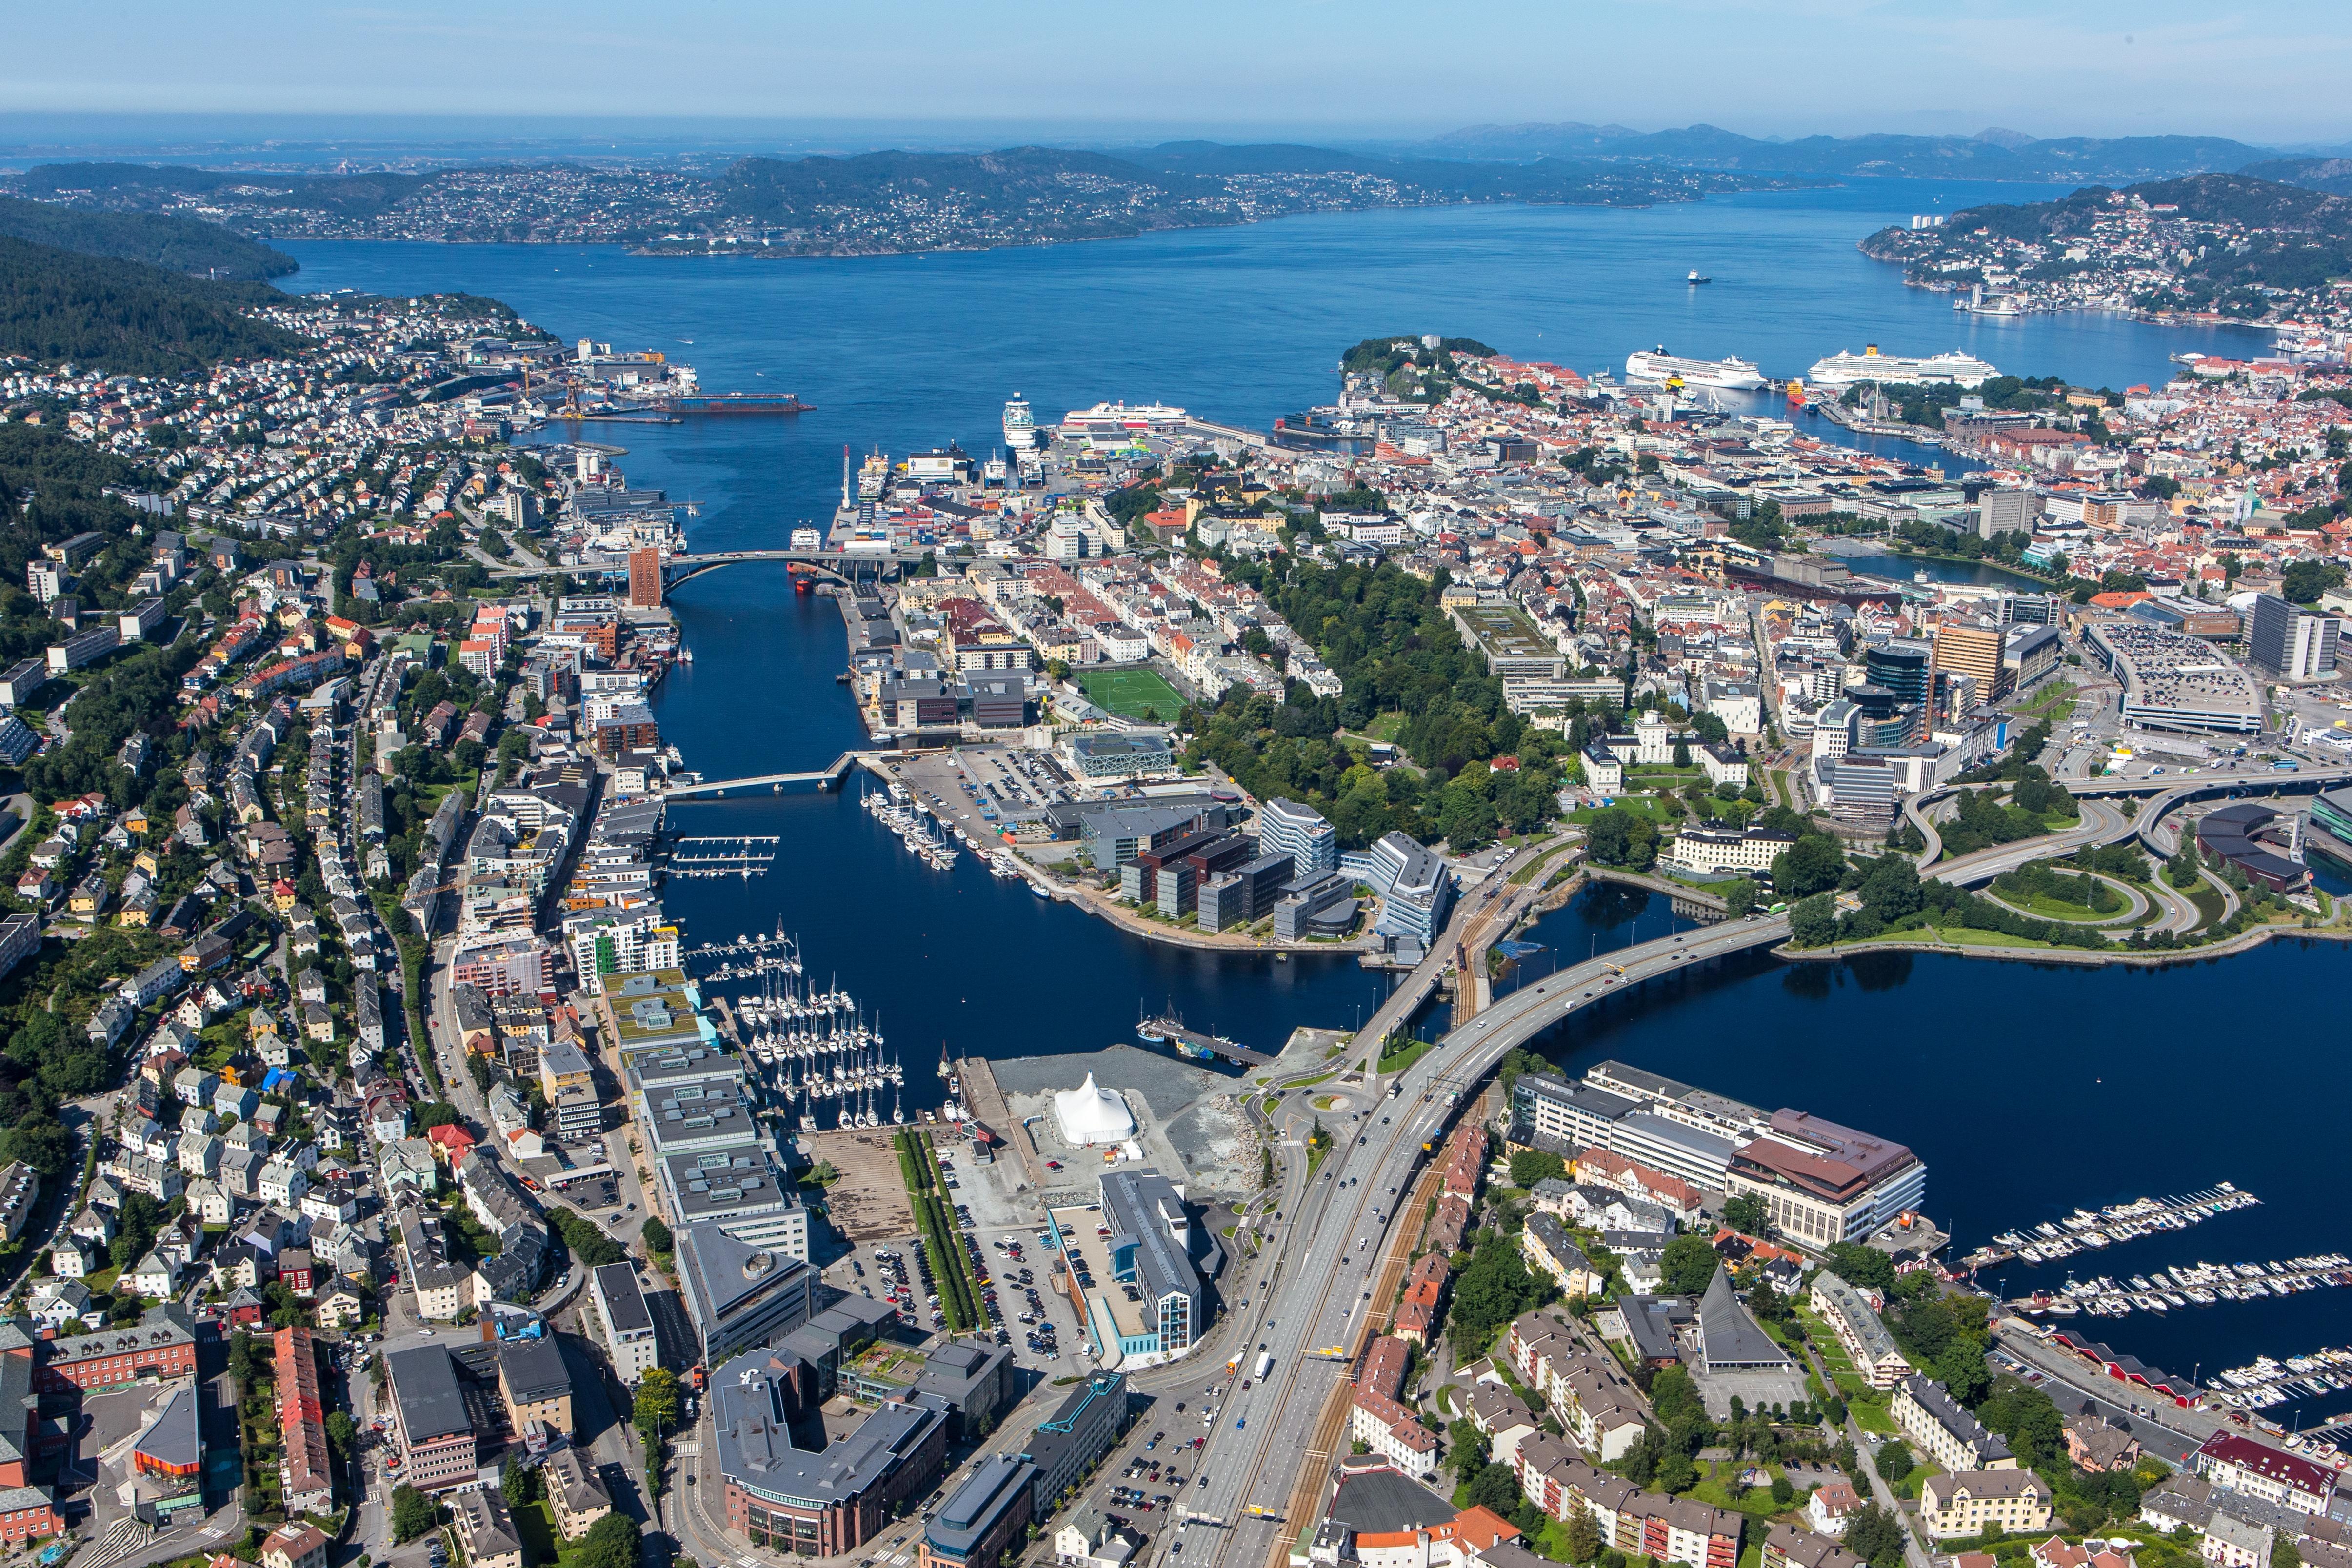 Marineholmen samler allerede mange marine aktører på sentrumssiden av Damsgårdssundet.